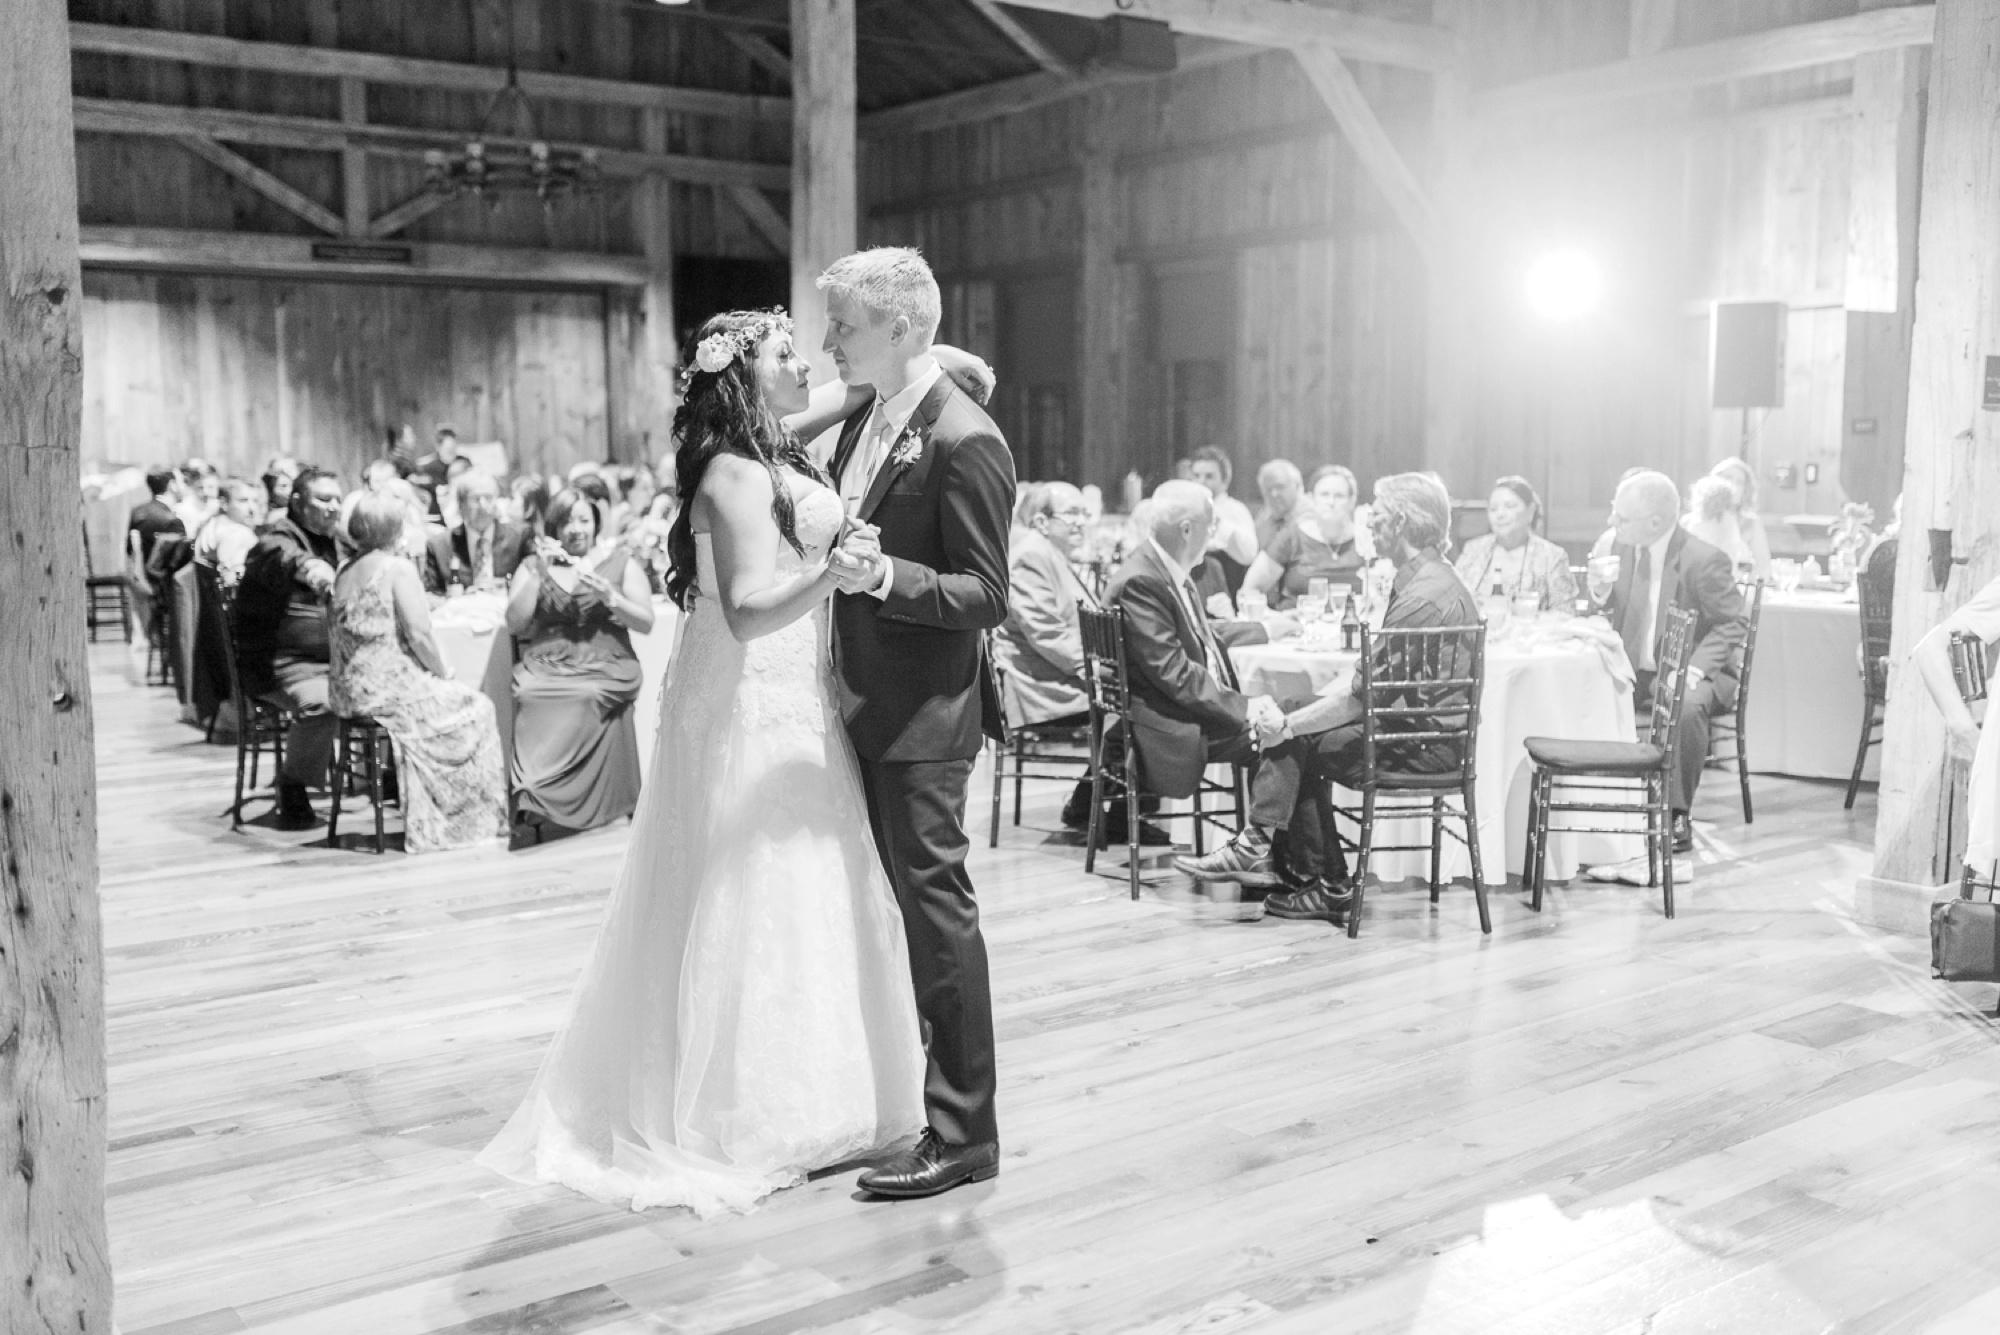 wells-barn-wedding-at-franklin-park-conservatory-127.jpg